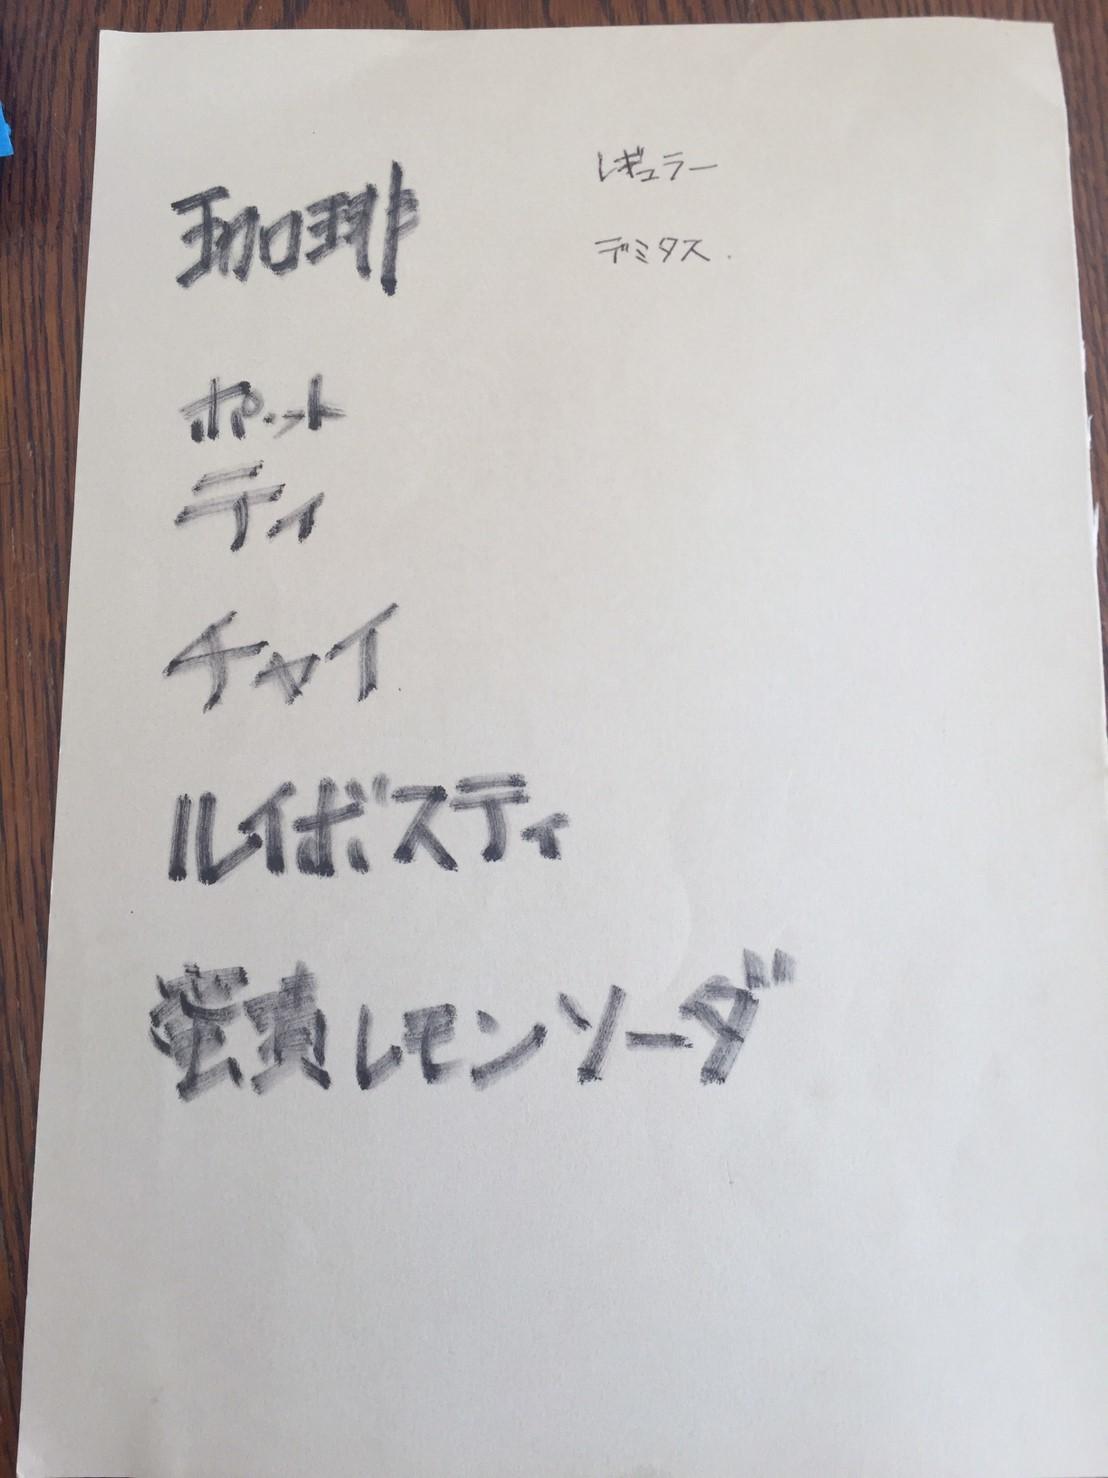 Tottori カルマ  カルマ焼飯_e0115904_22251838.jpg